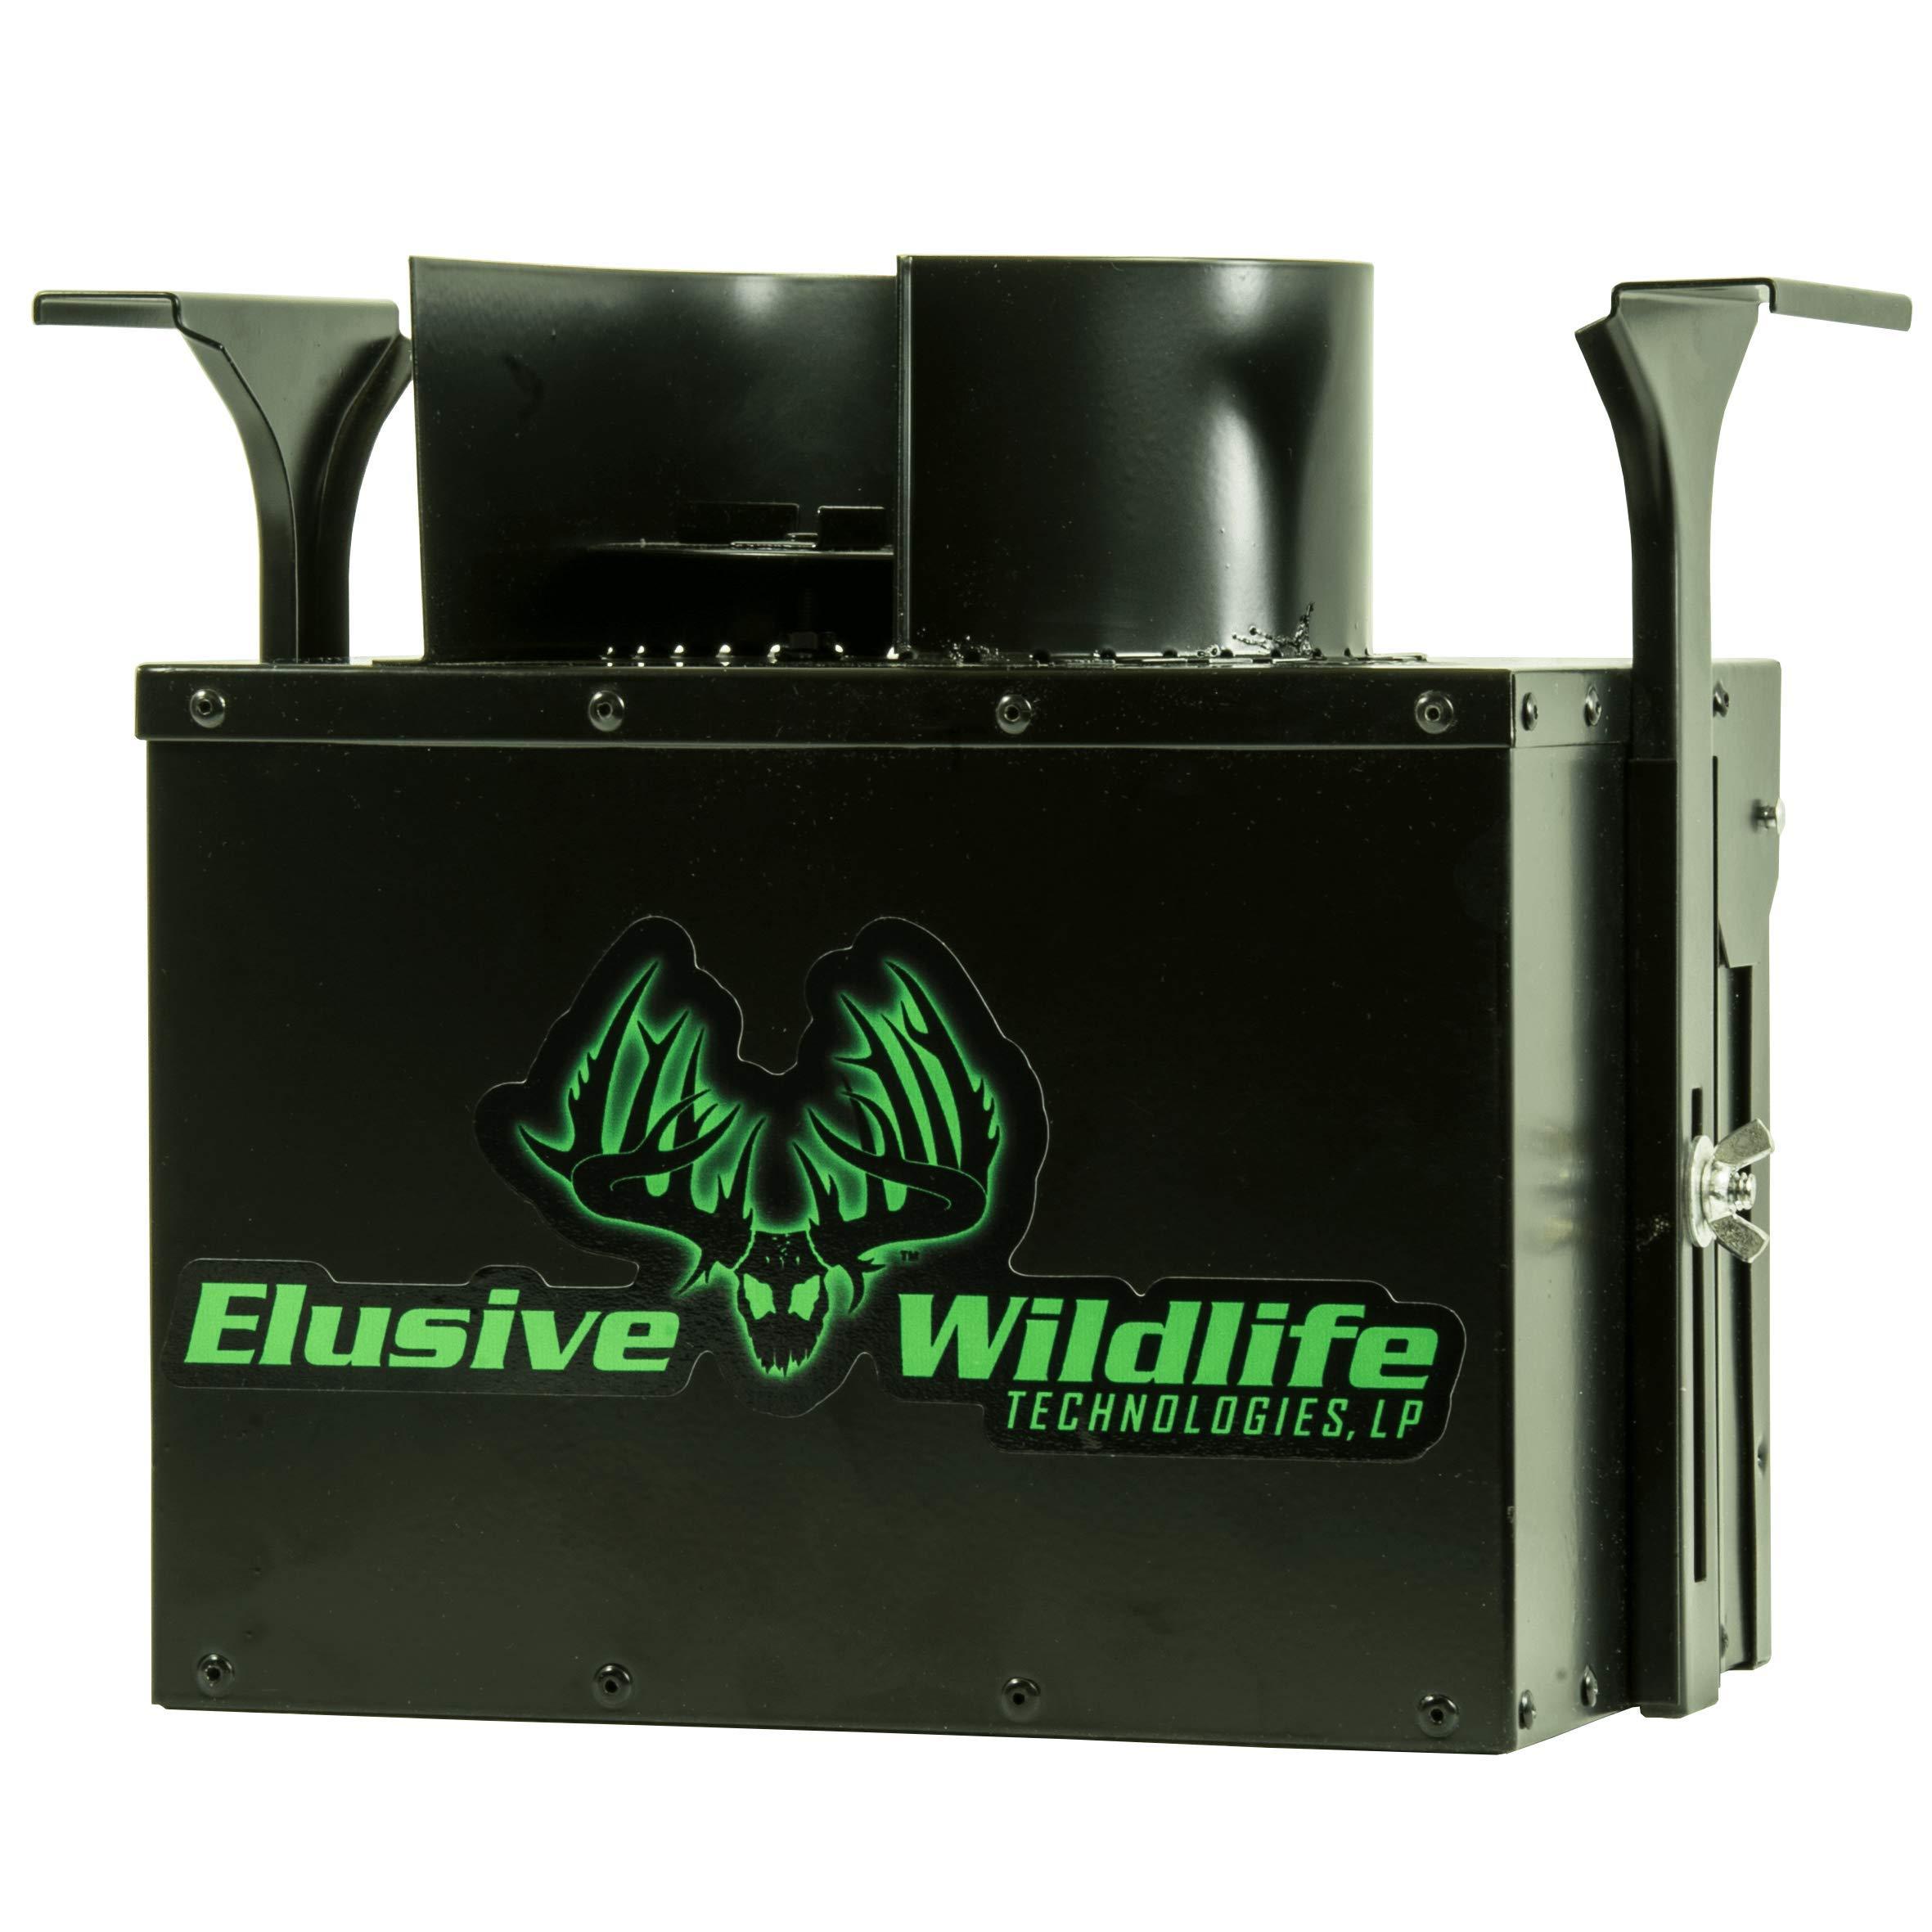 Elusive Wildlife Directional Feeder Control Unit with Timer (Black, Directional Feeder Control Unit with Timer) by Elusive Wildlife